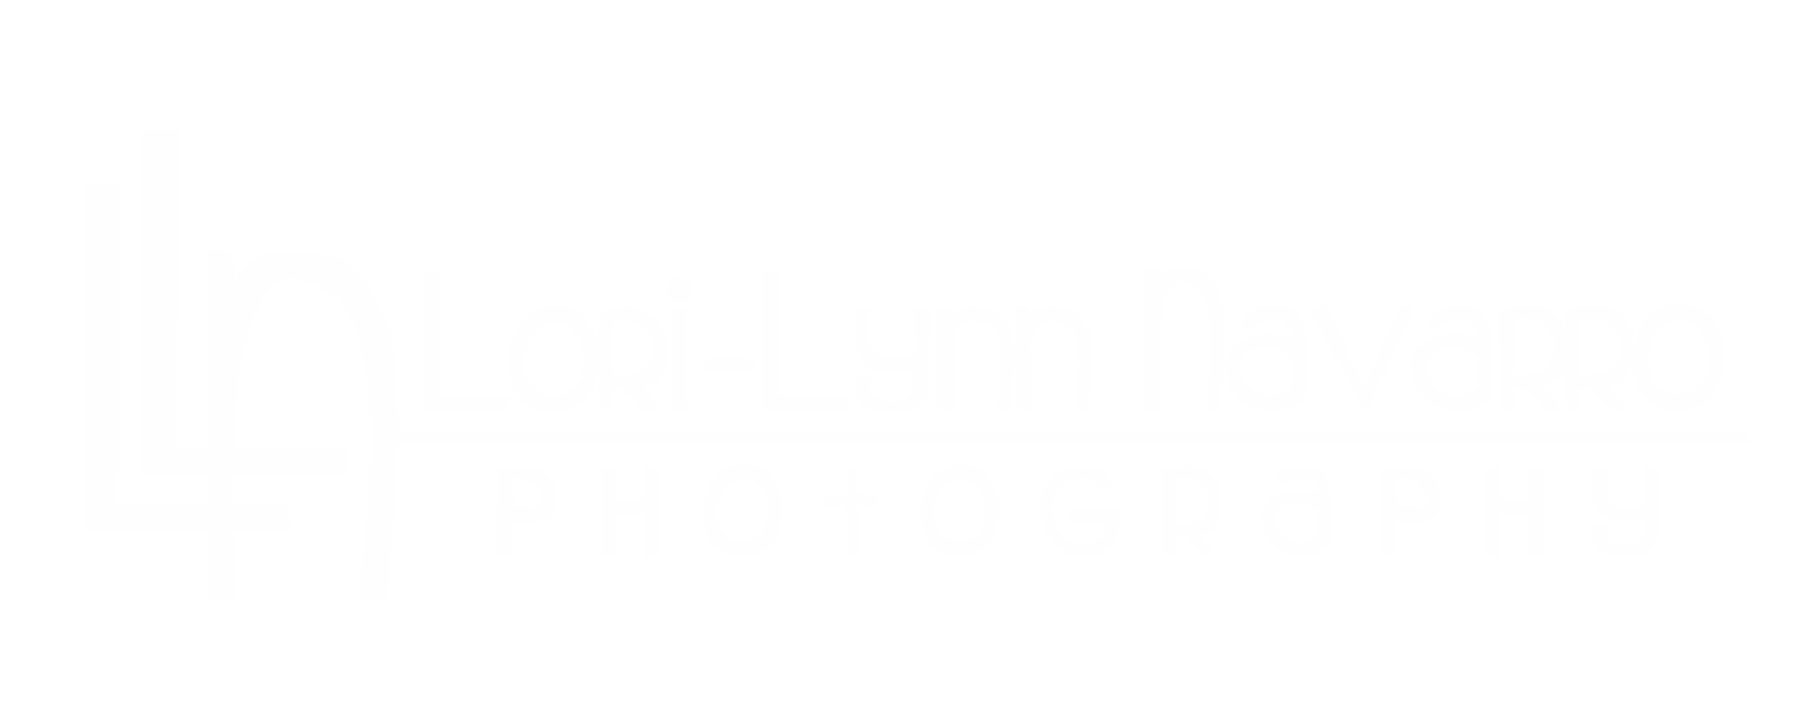 Lori-Lynn Navarro Photography